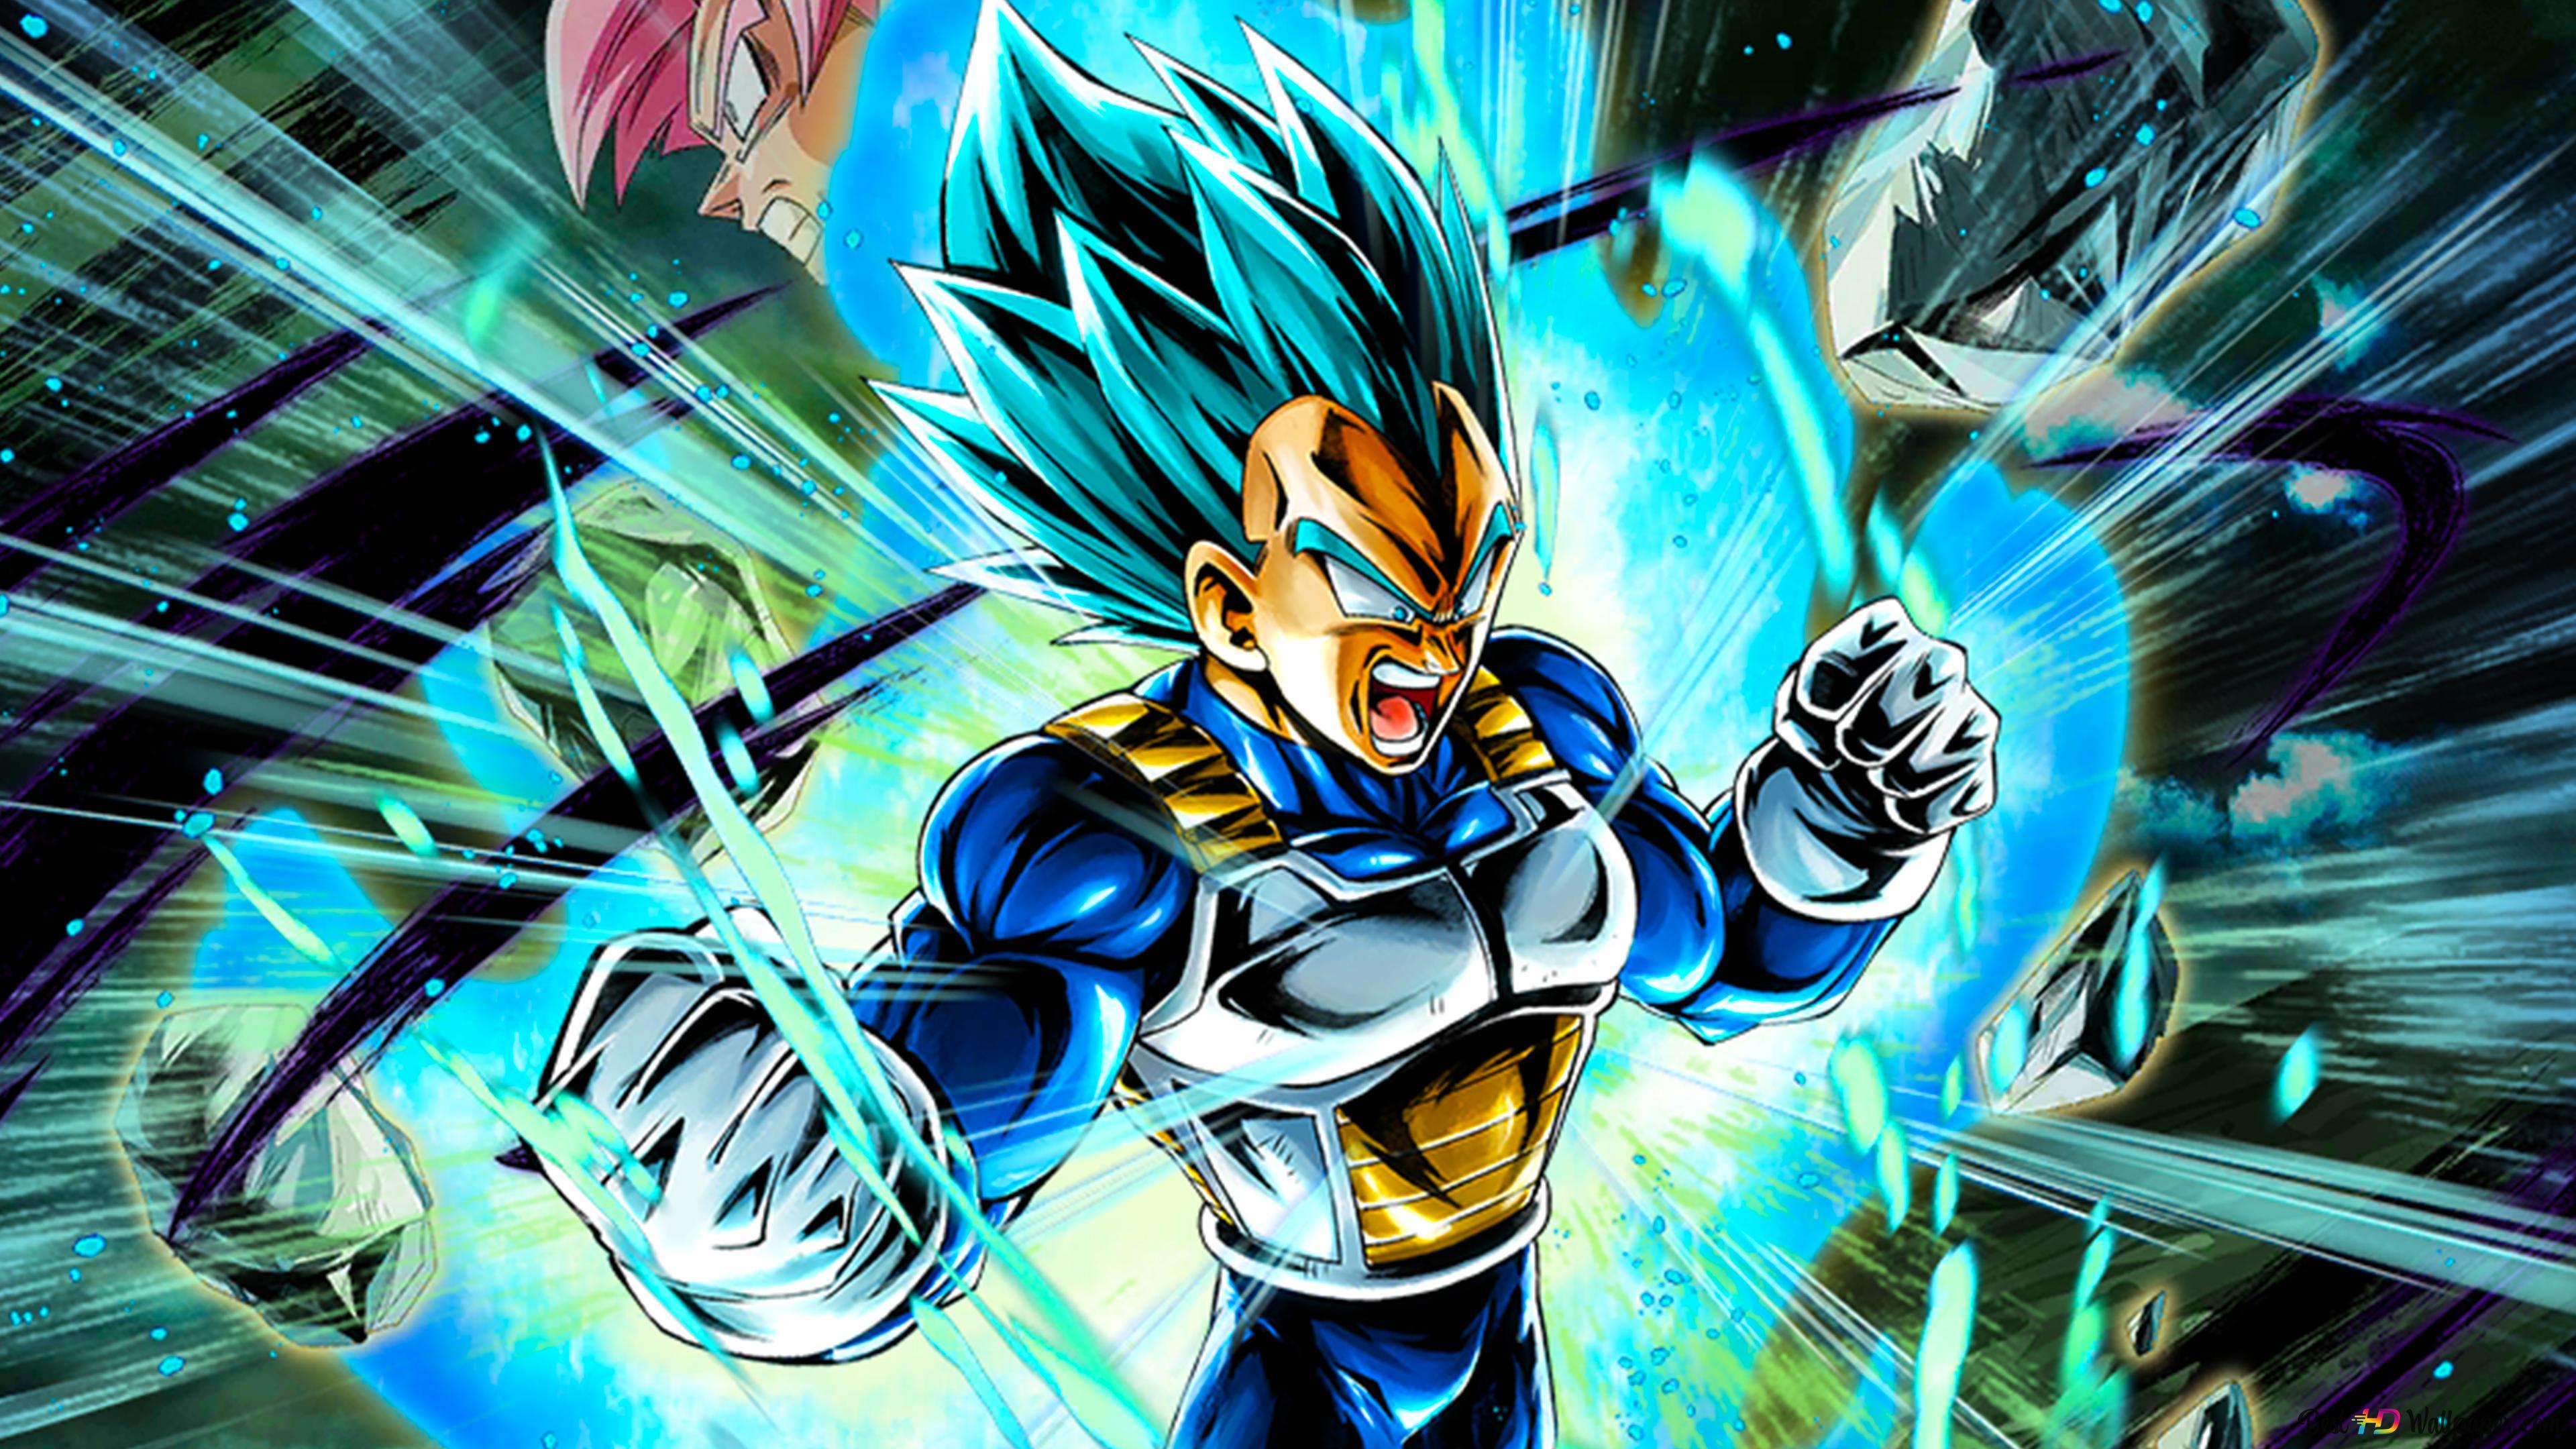 Super Saiyan Blue Vegeta Dari Dragon Ball Super Dragon Ball Legends Arts Untuk Desktop Unduhan Wallpaper Hd